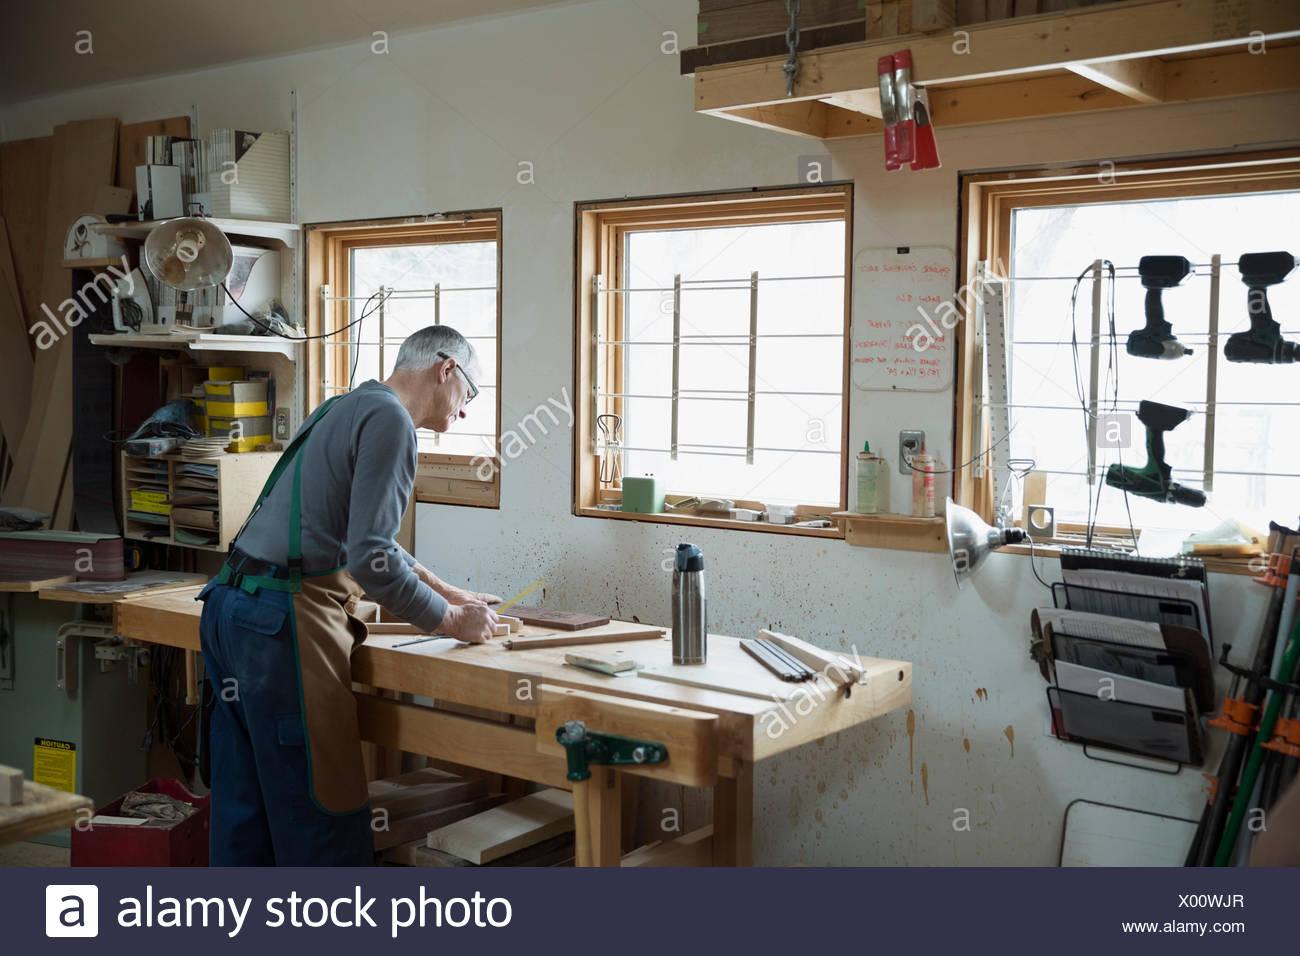 Senior carpenter working in workshop - Stock Image